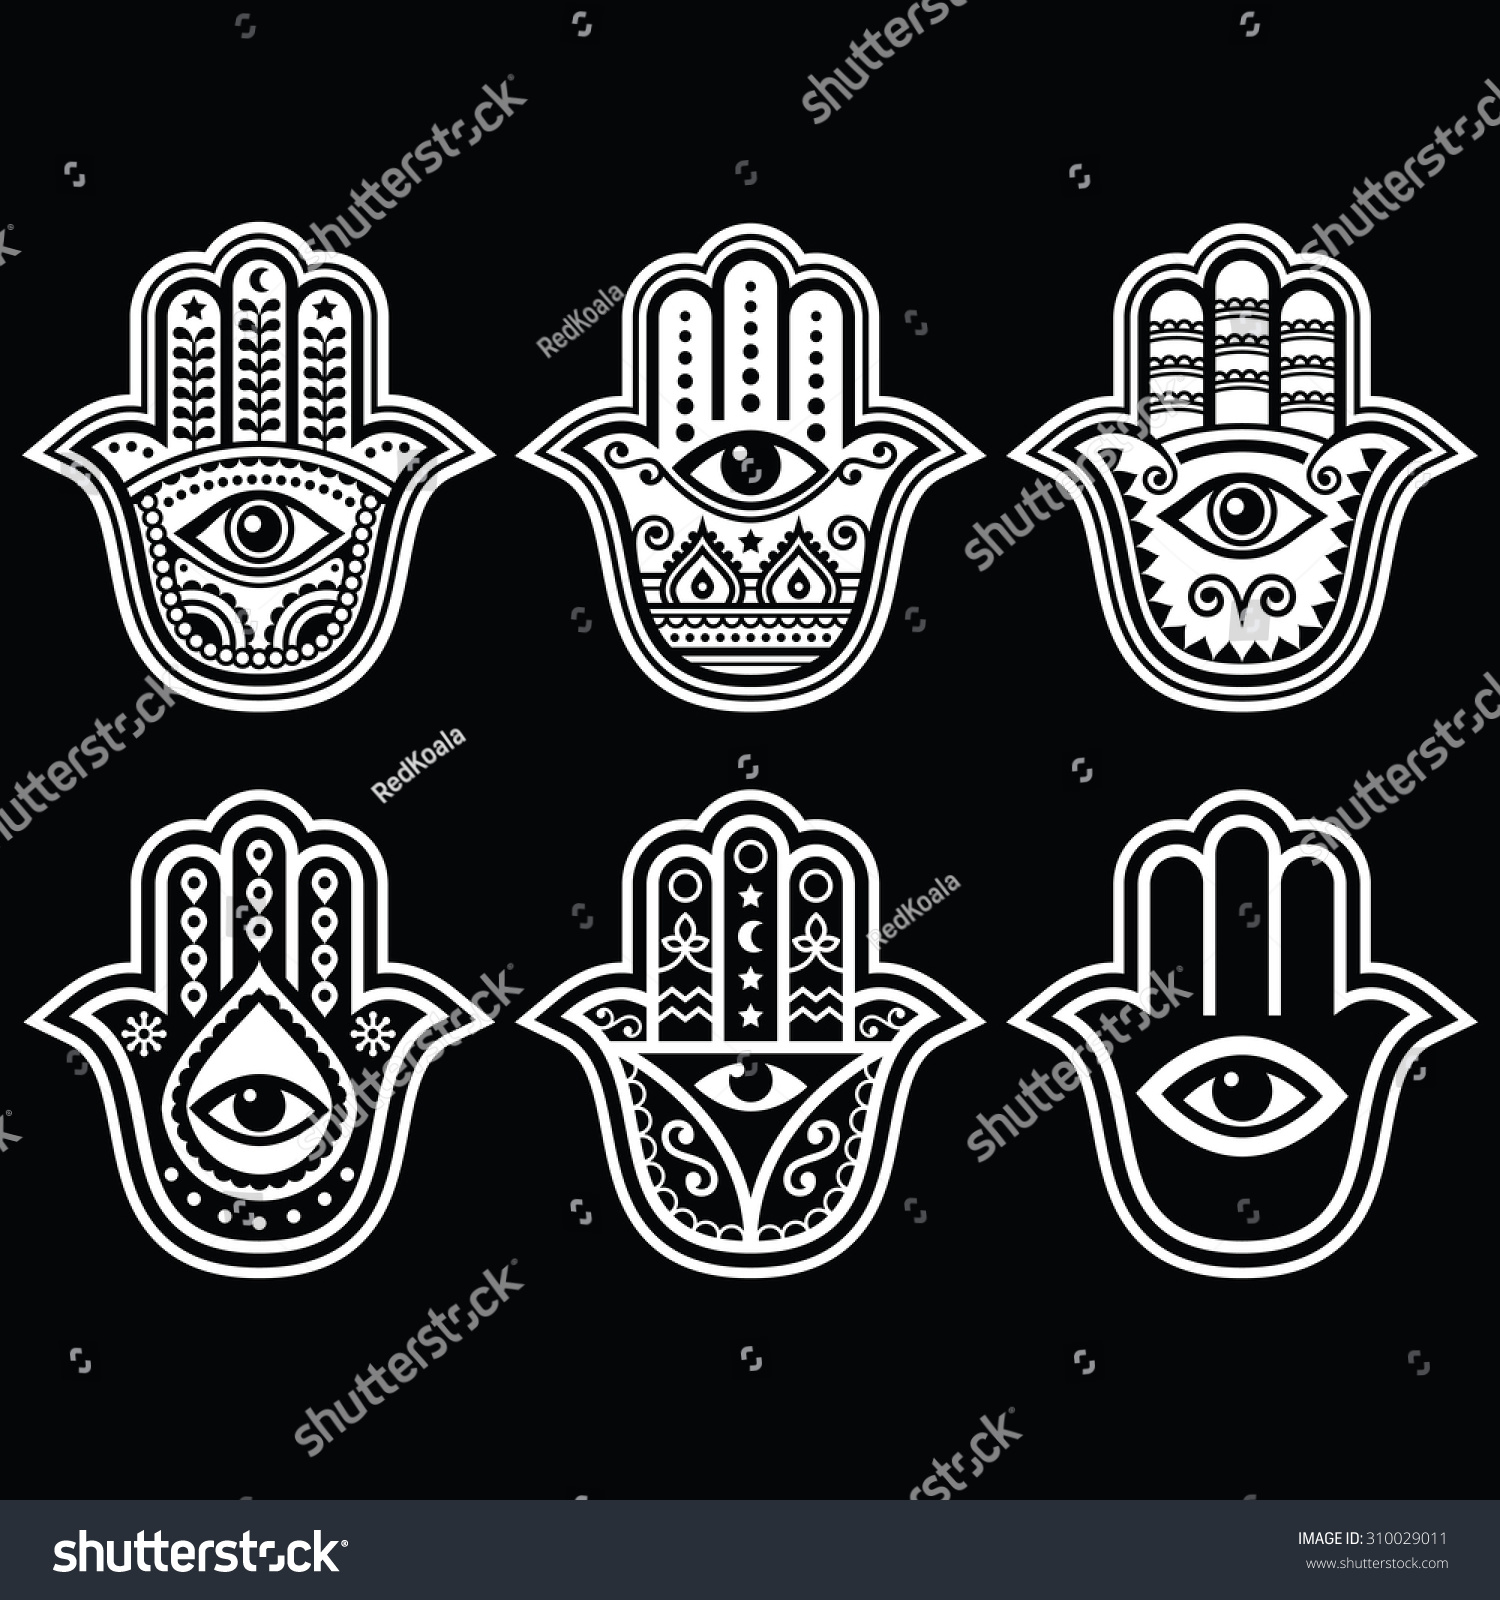 Devil Hand Symbols Demon Devil Hand Holding Blank Sign Stock